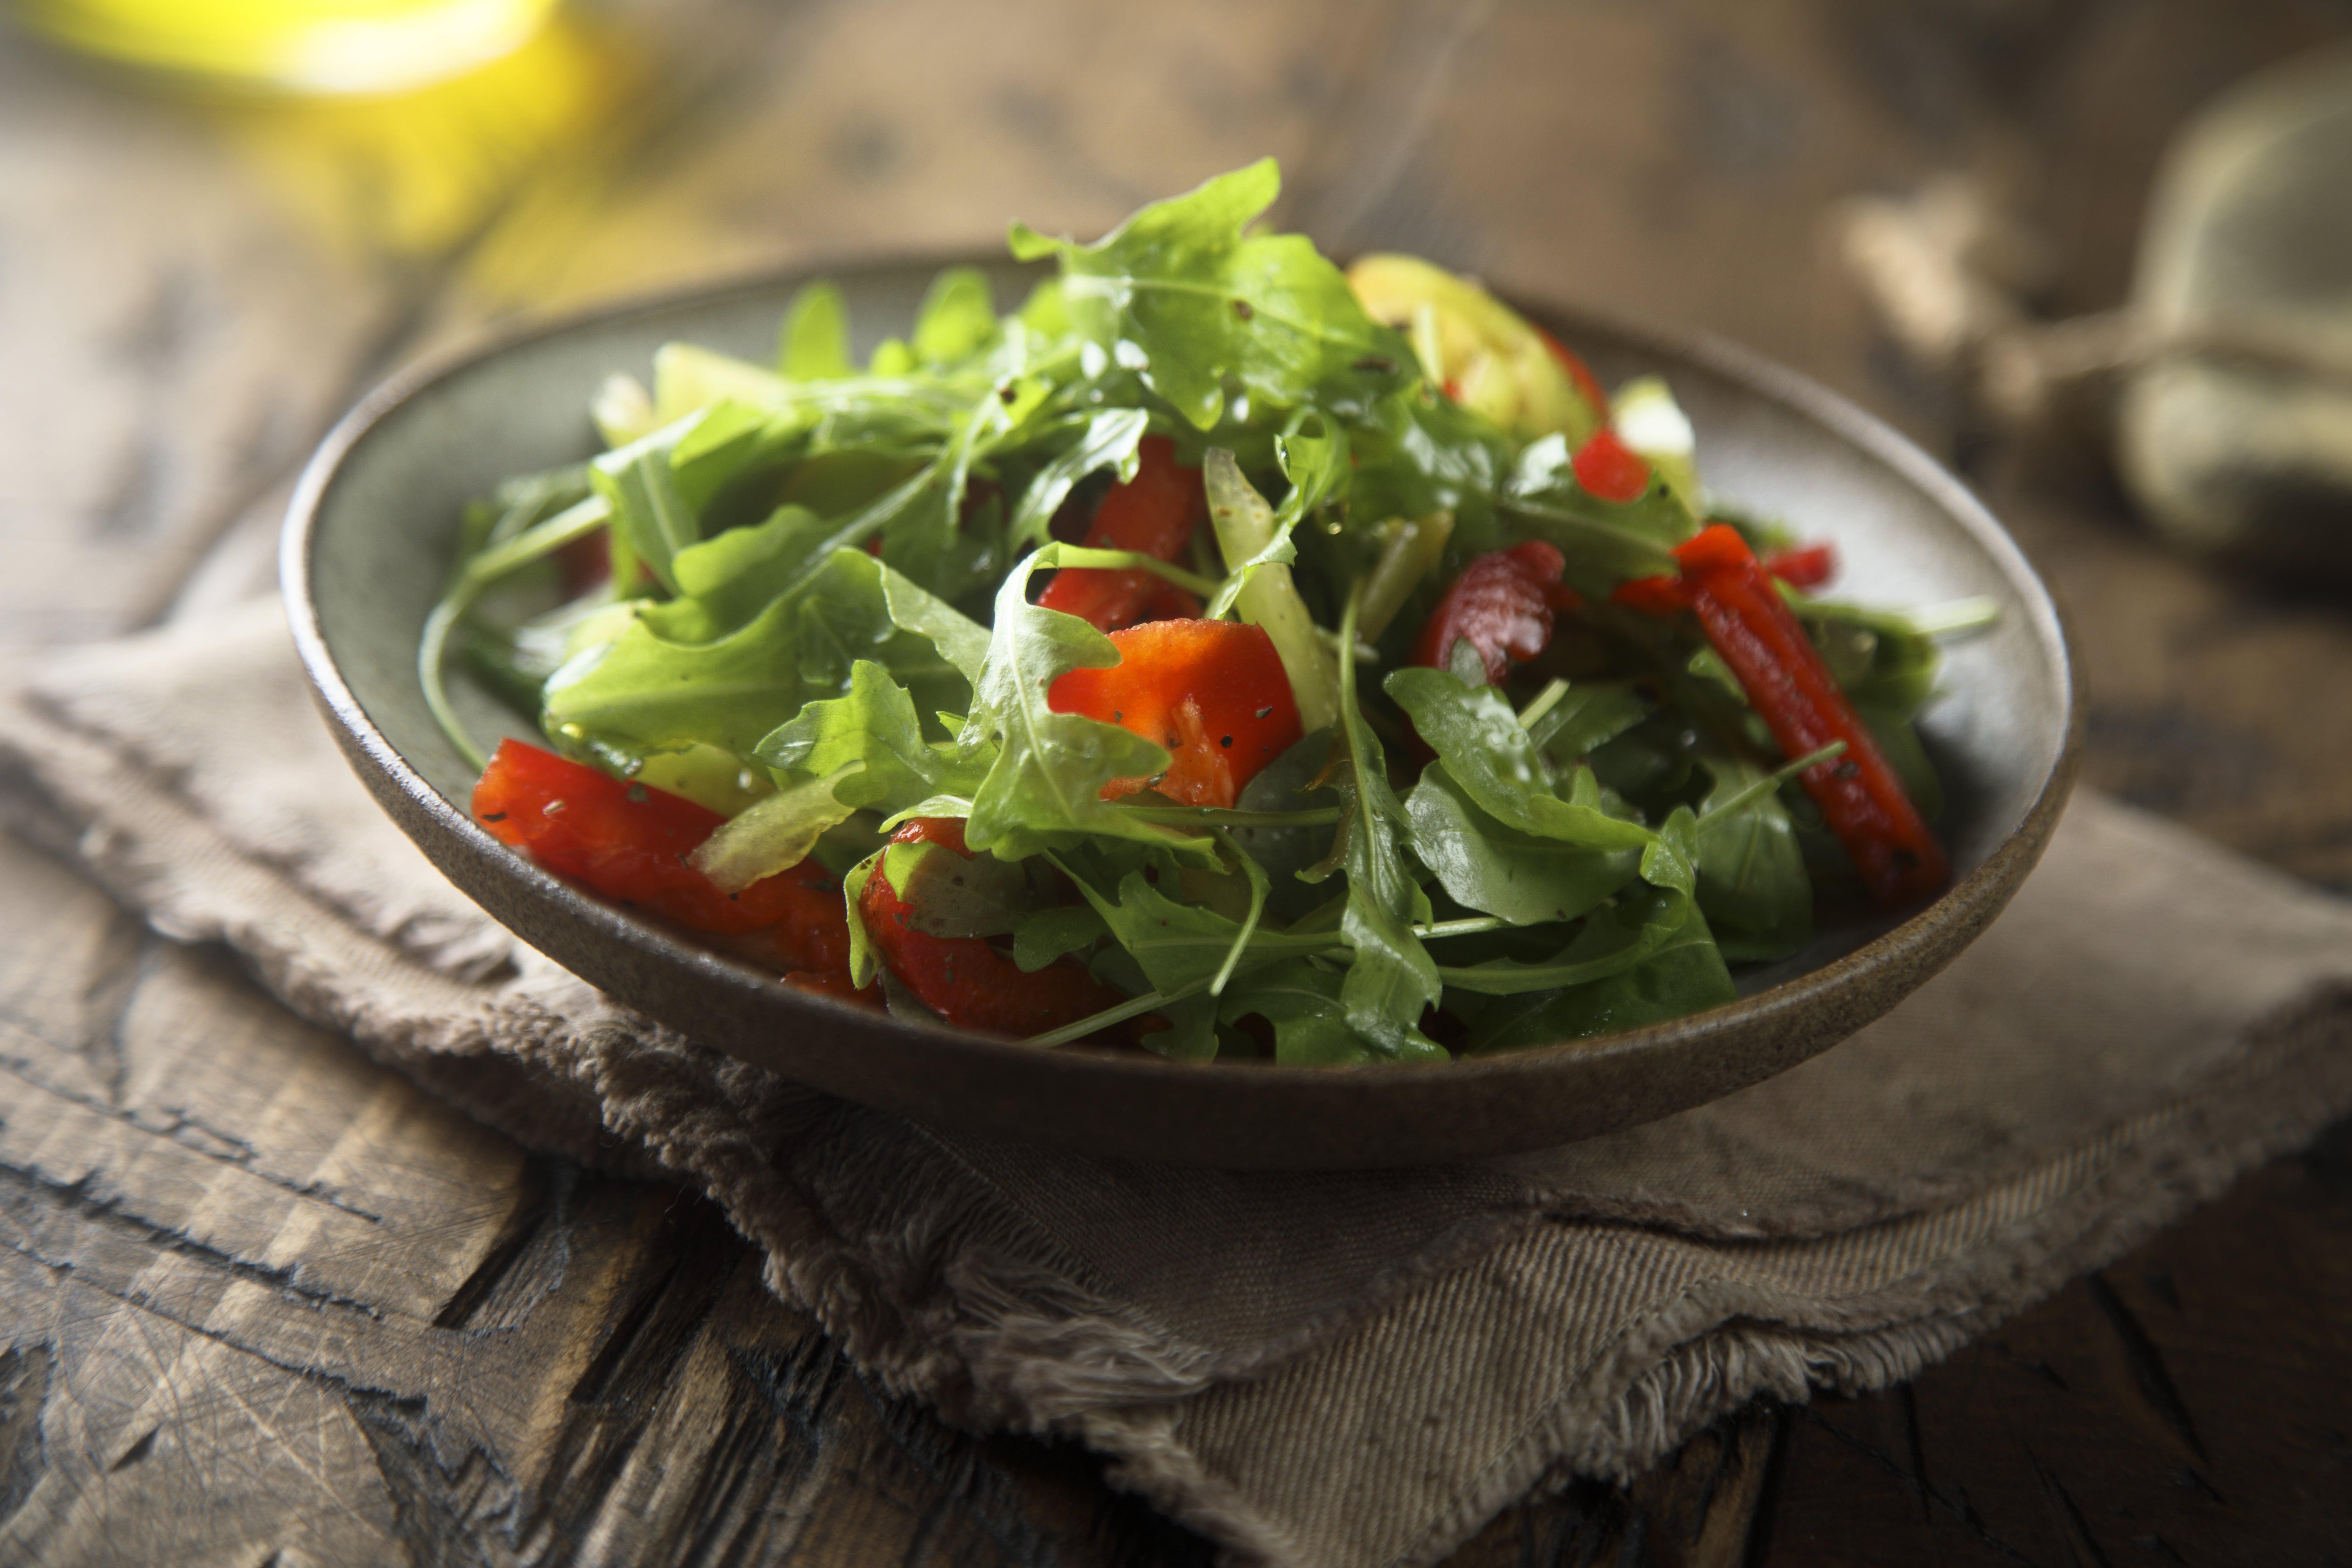 Healthy arugula salad with vegetables